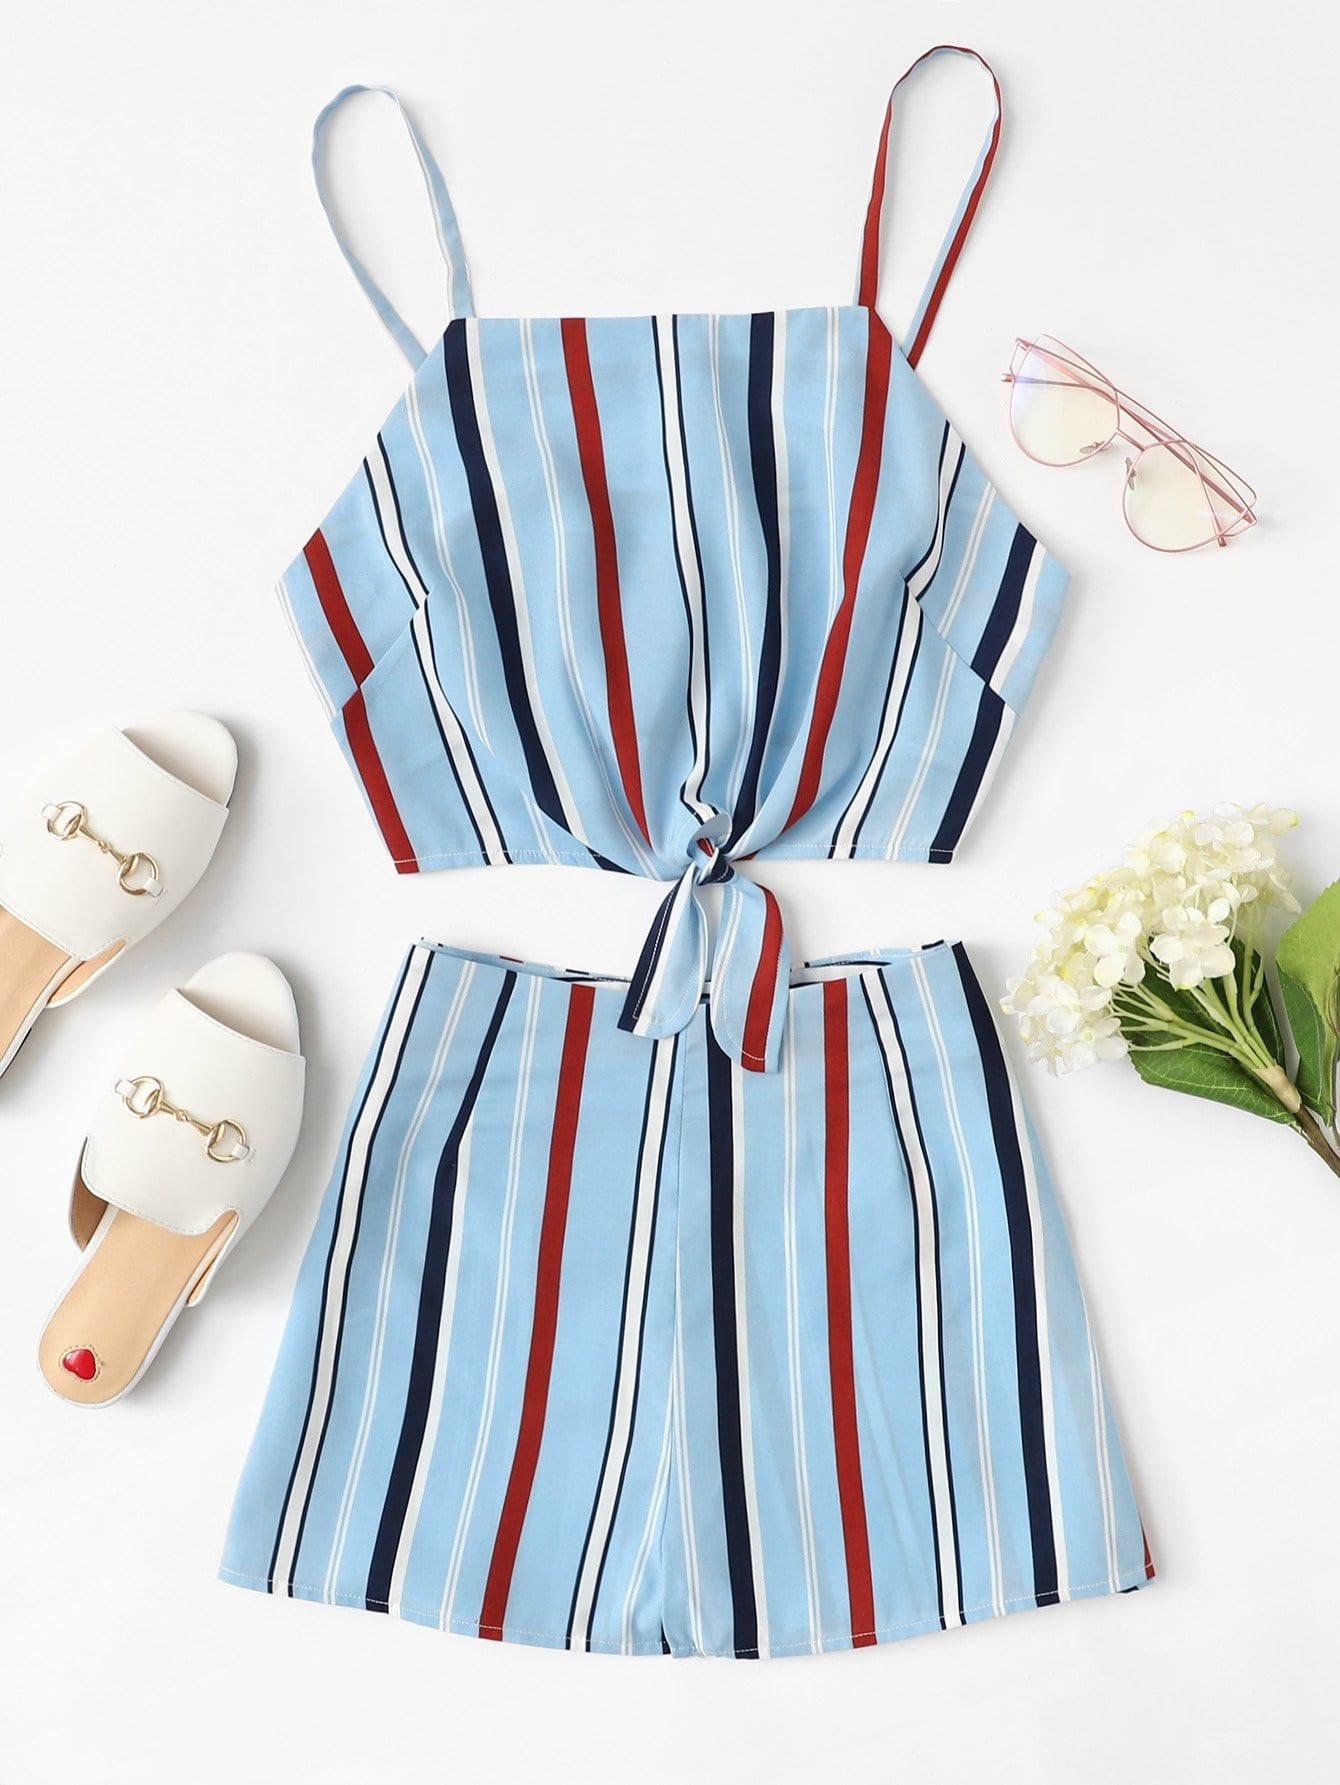 Knot Hem Striped Cami Top & Shorts Set flamingo embroidered striped top and curved hem shorts set